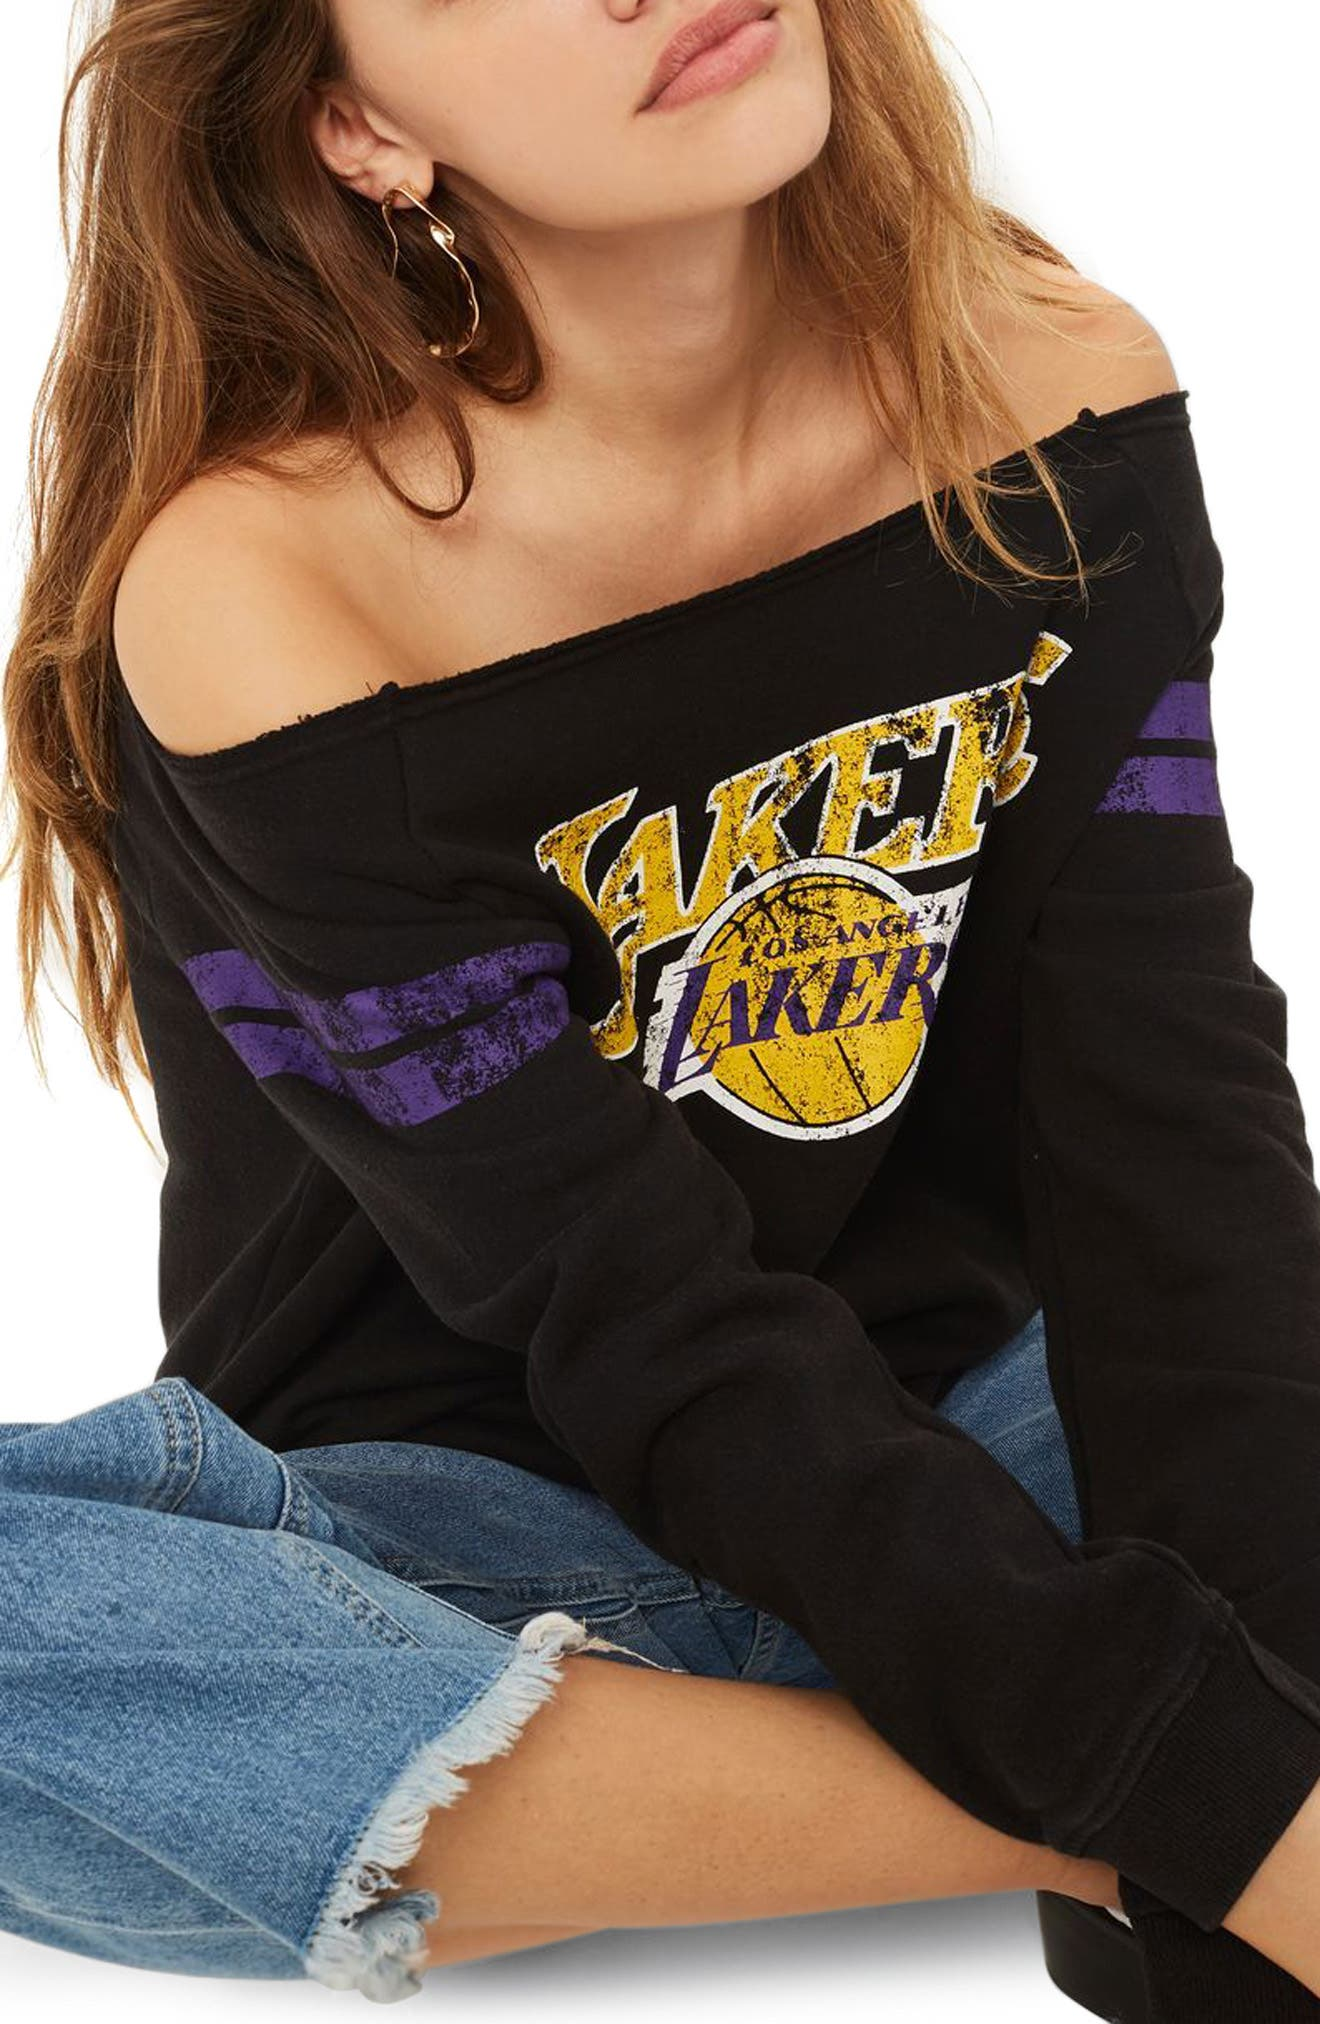 x UNK Lakers Convertible Sweatshirt,                         Main,                         color, 001